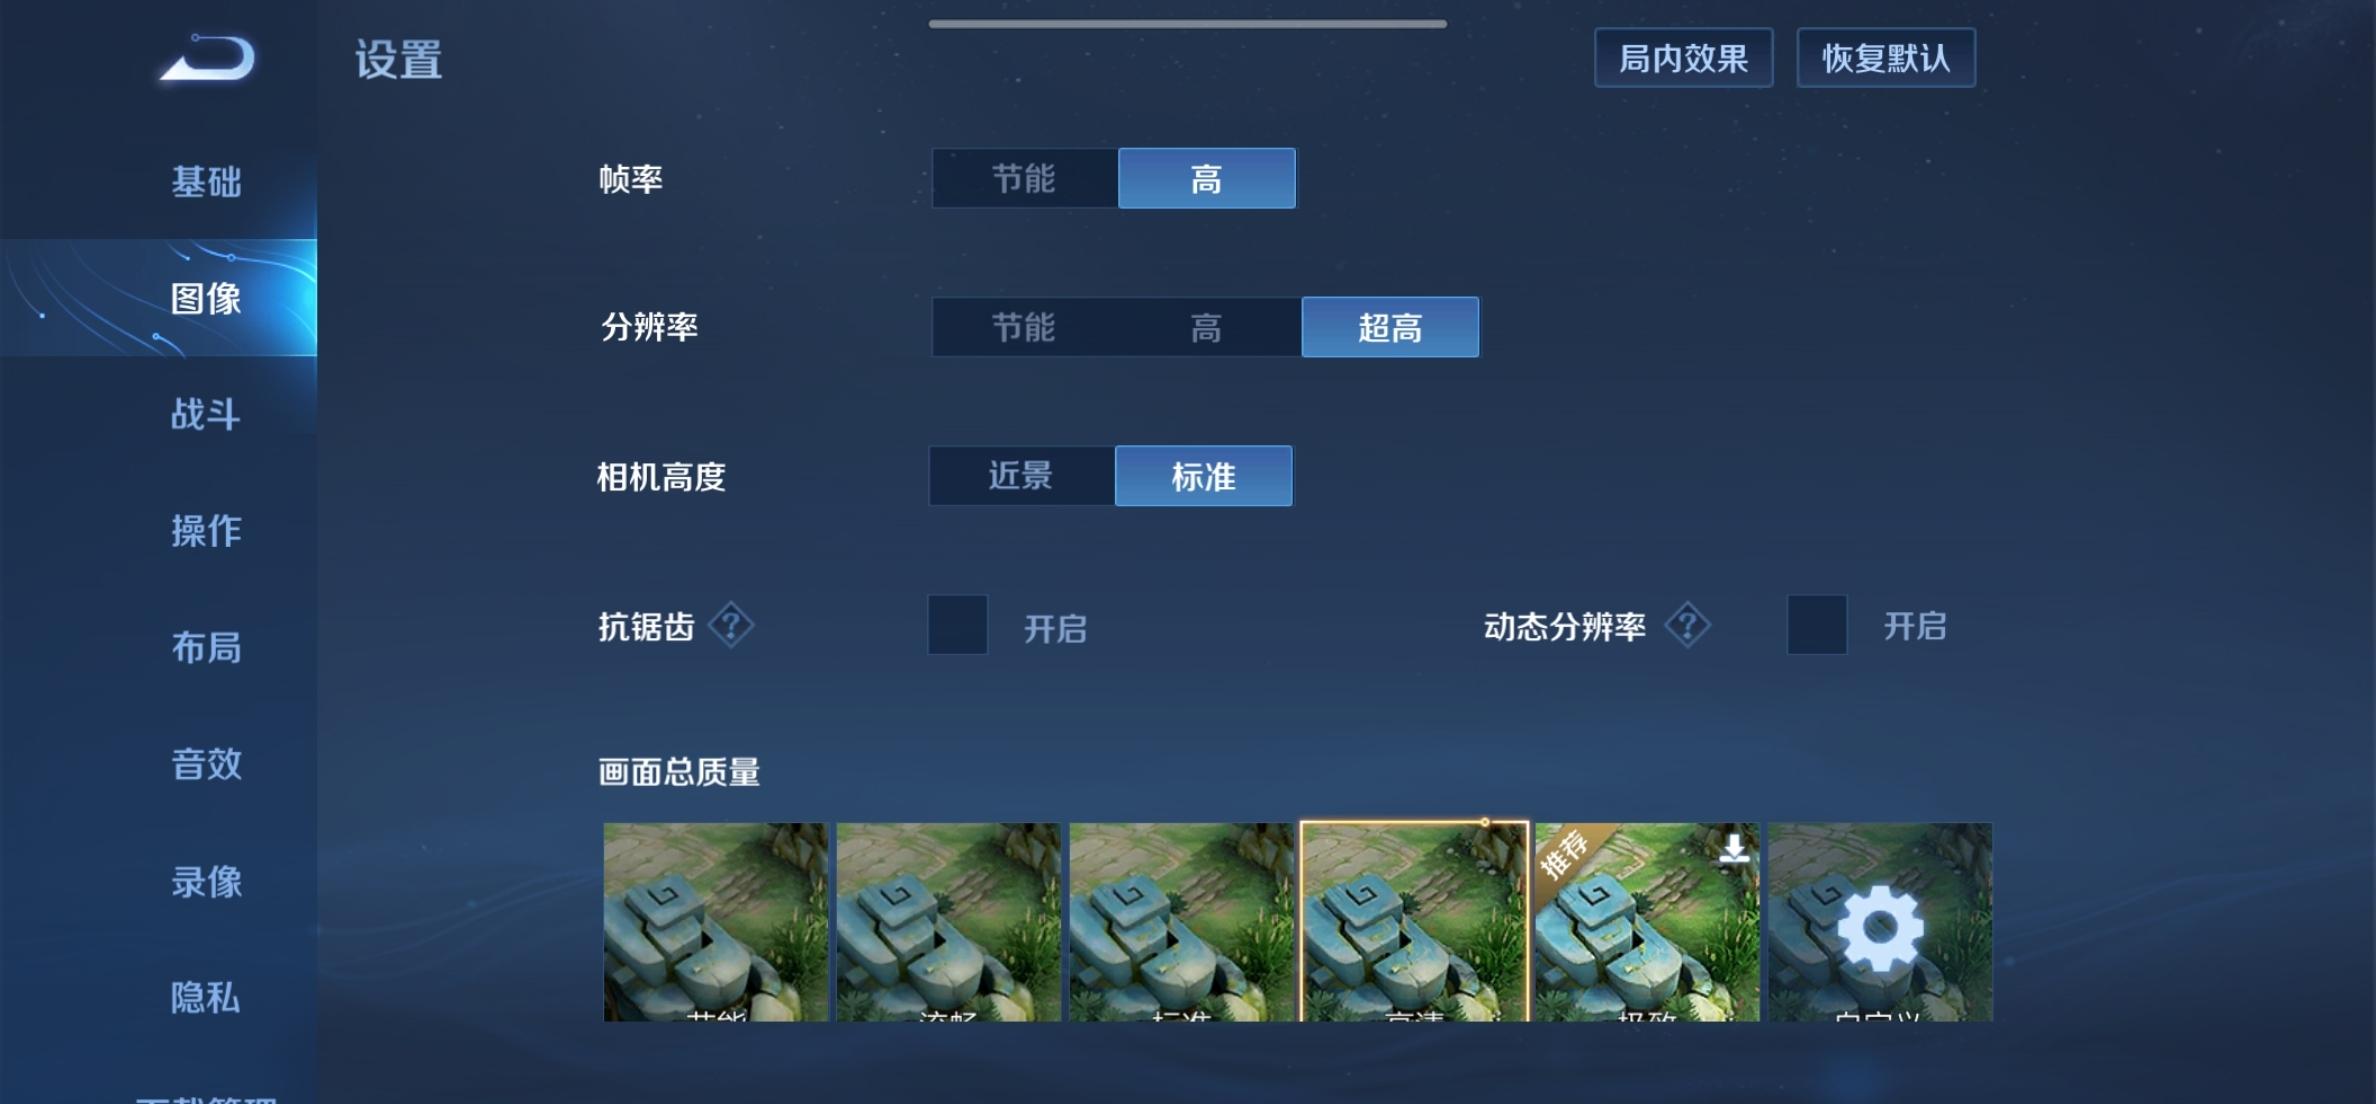 Screenshot_20211012_214804_com.tencent.tmgp.sgame.jpg